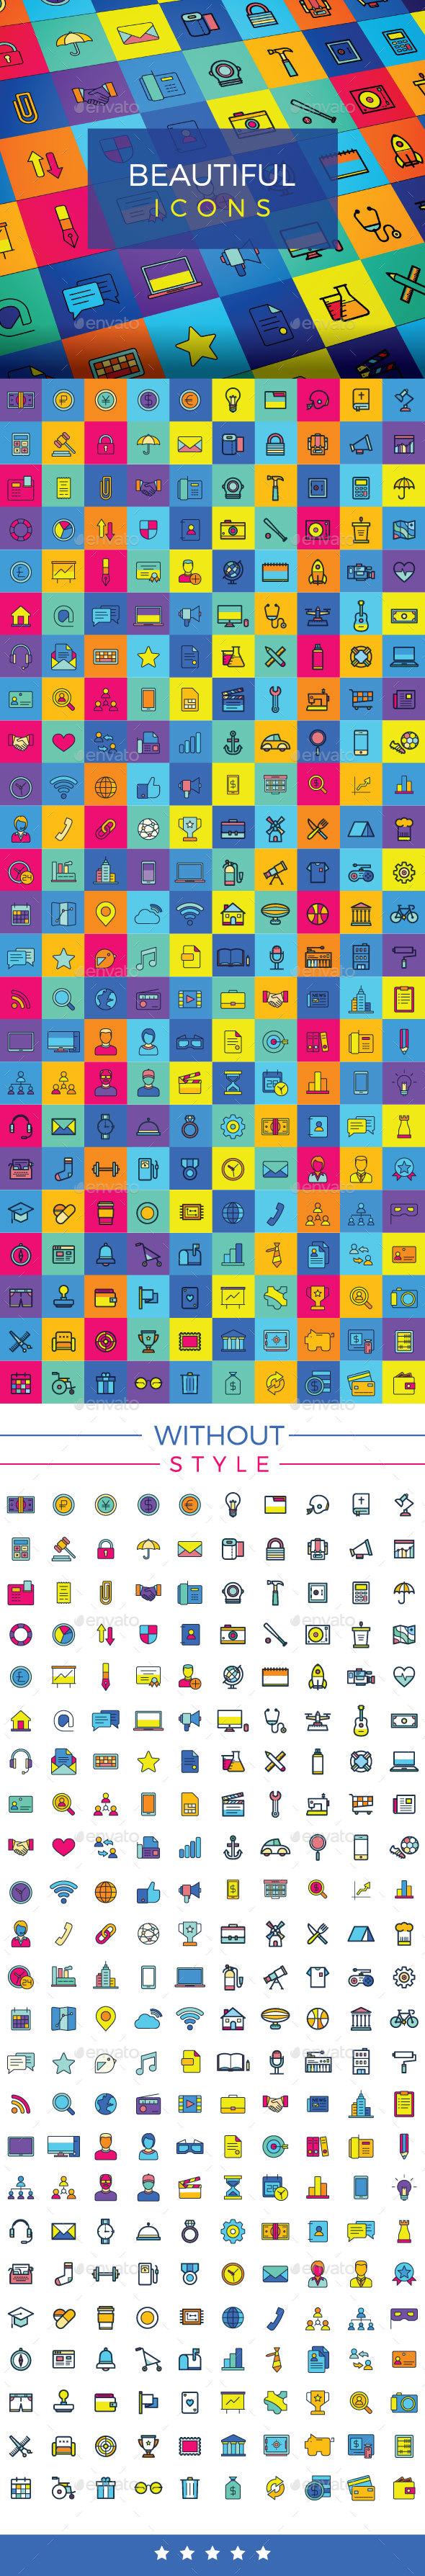 Icon Design, Icons Set, Colorful Icons - Web Icons